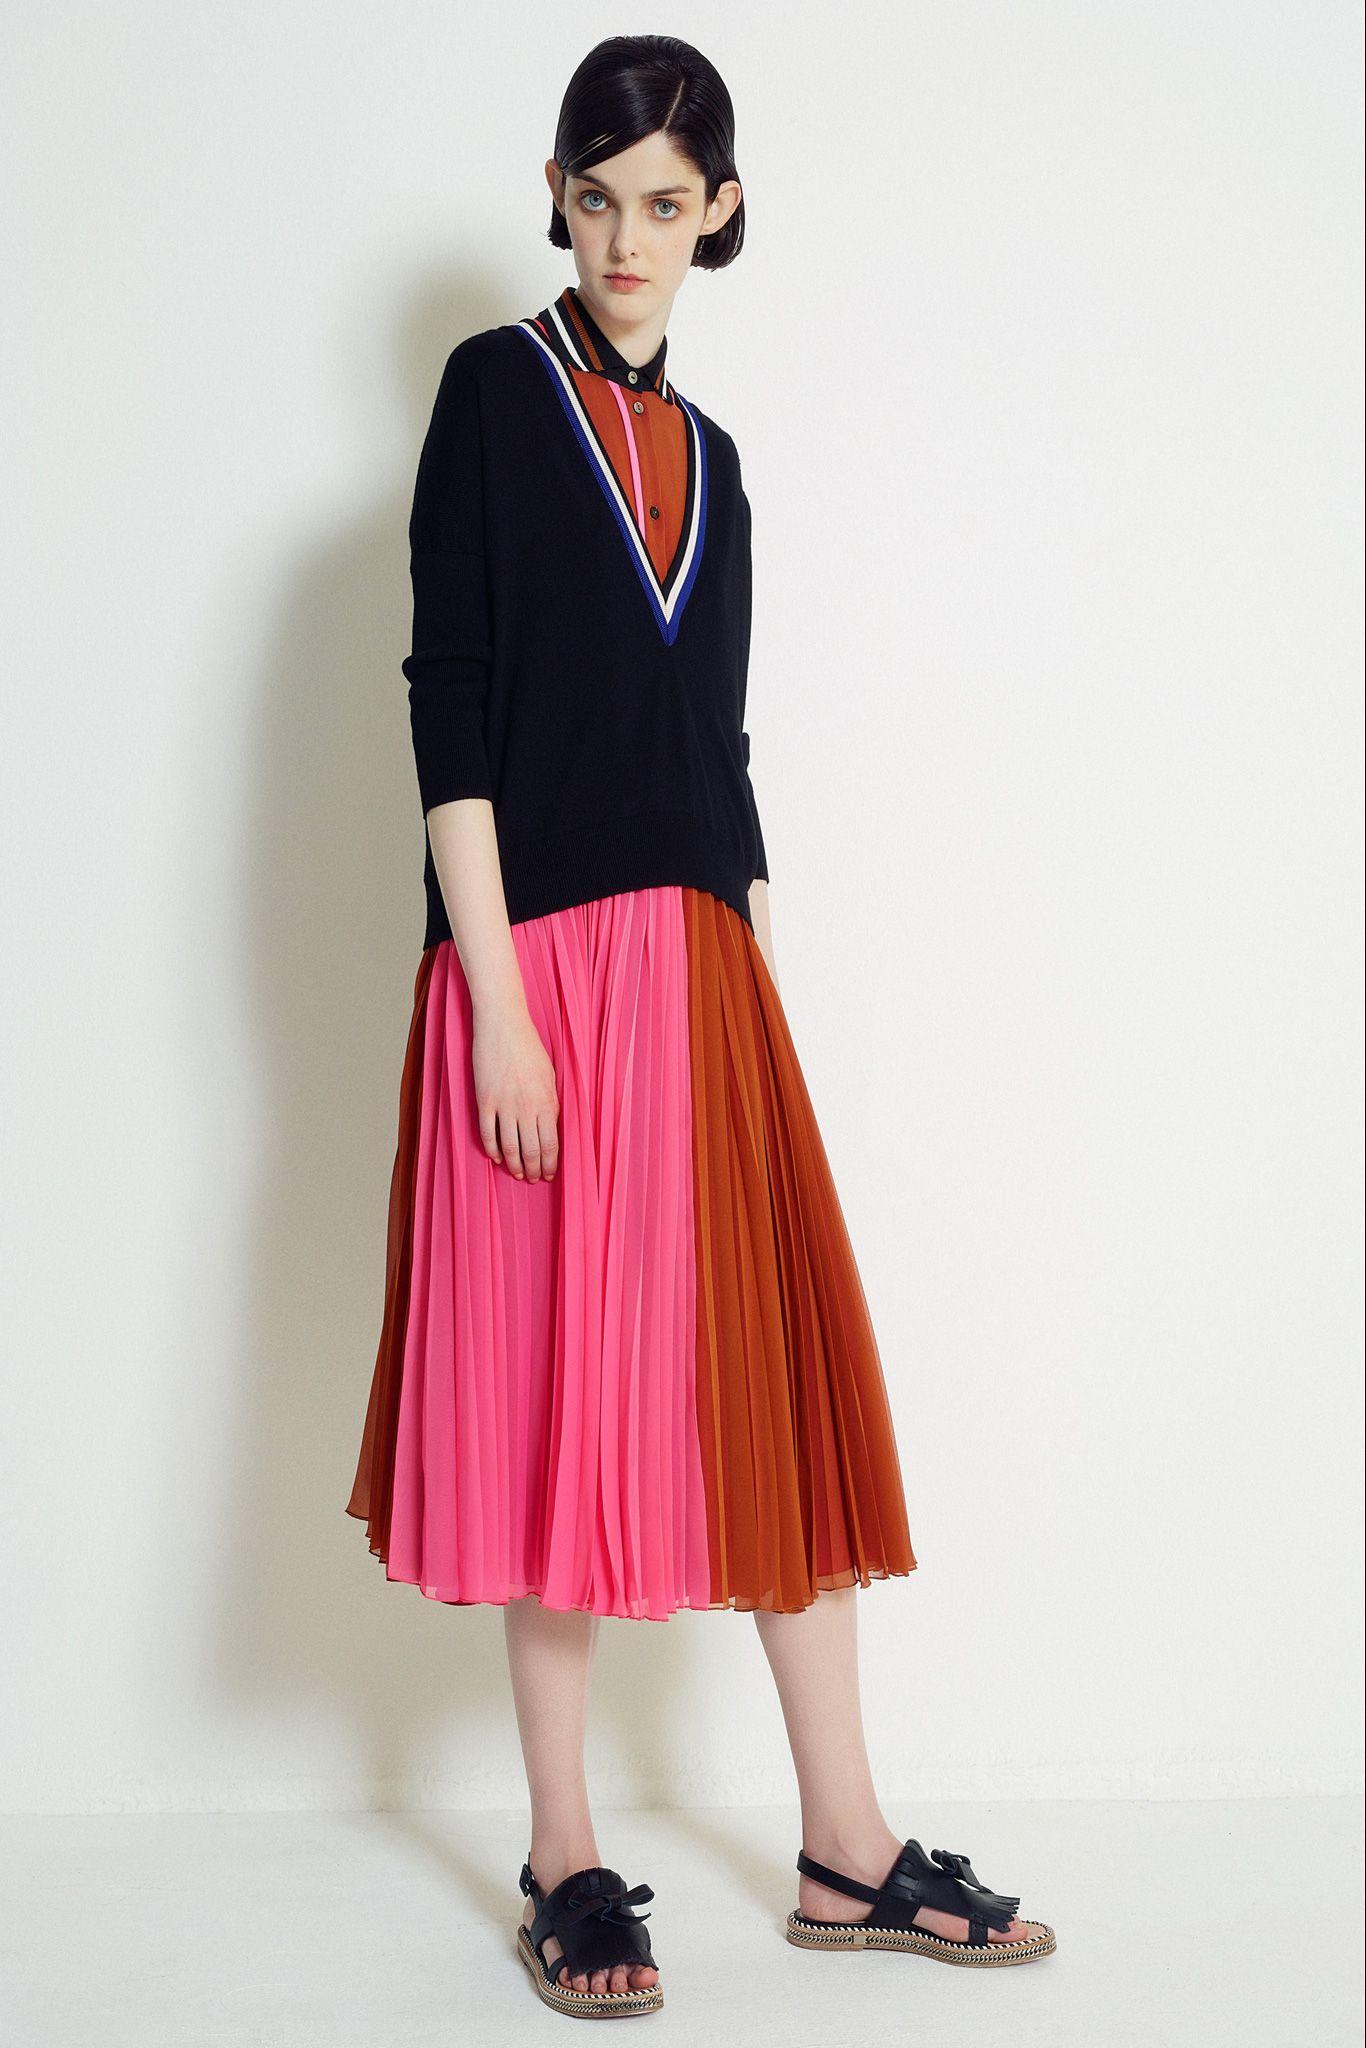 Spring 2015 Ready-to-Wear - Bouchra Jarrar